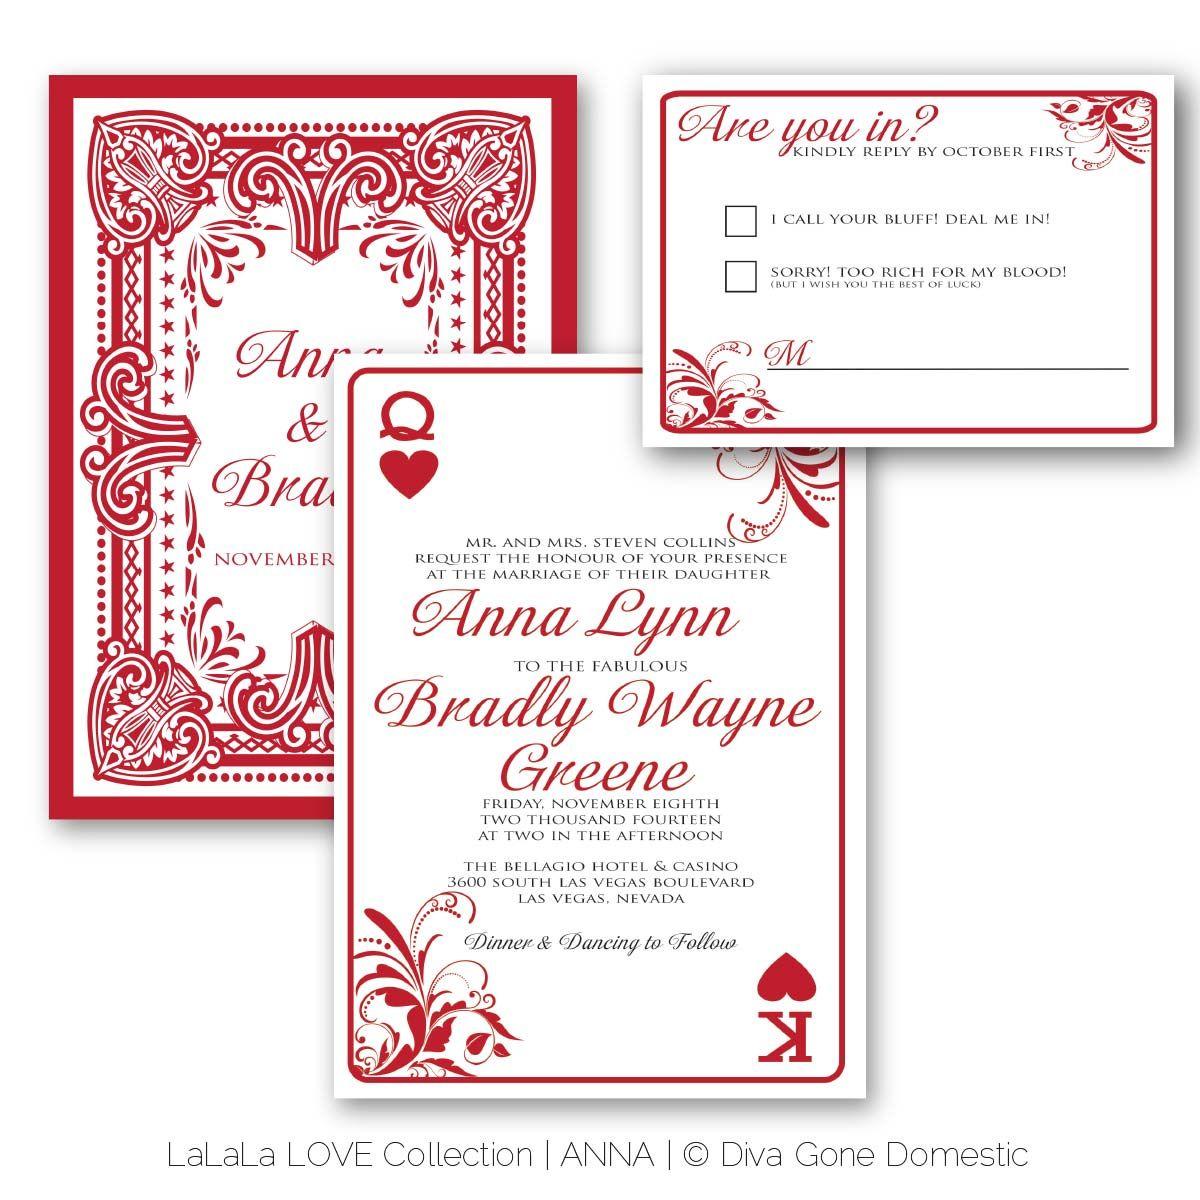 vegas wedding invitations Anna Playing Card Casino Las Vegas wedding invitation DGD Invitations